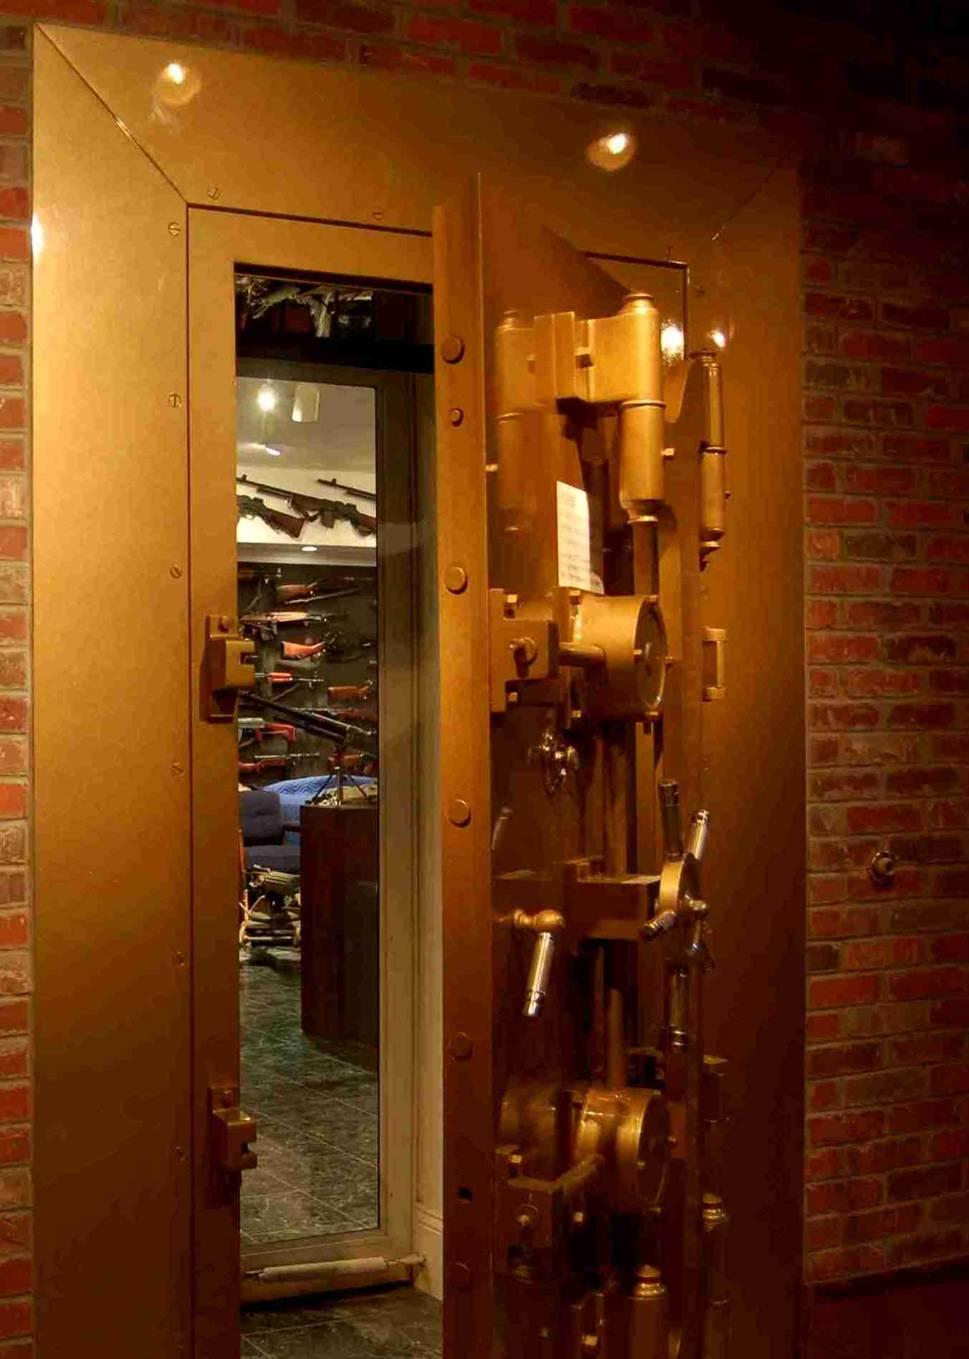 Correll cach charlton heston 39 s gun vault for Gun vault rooms